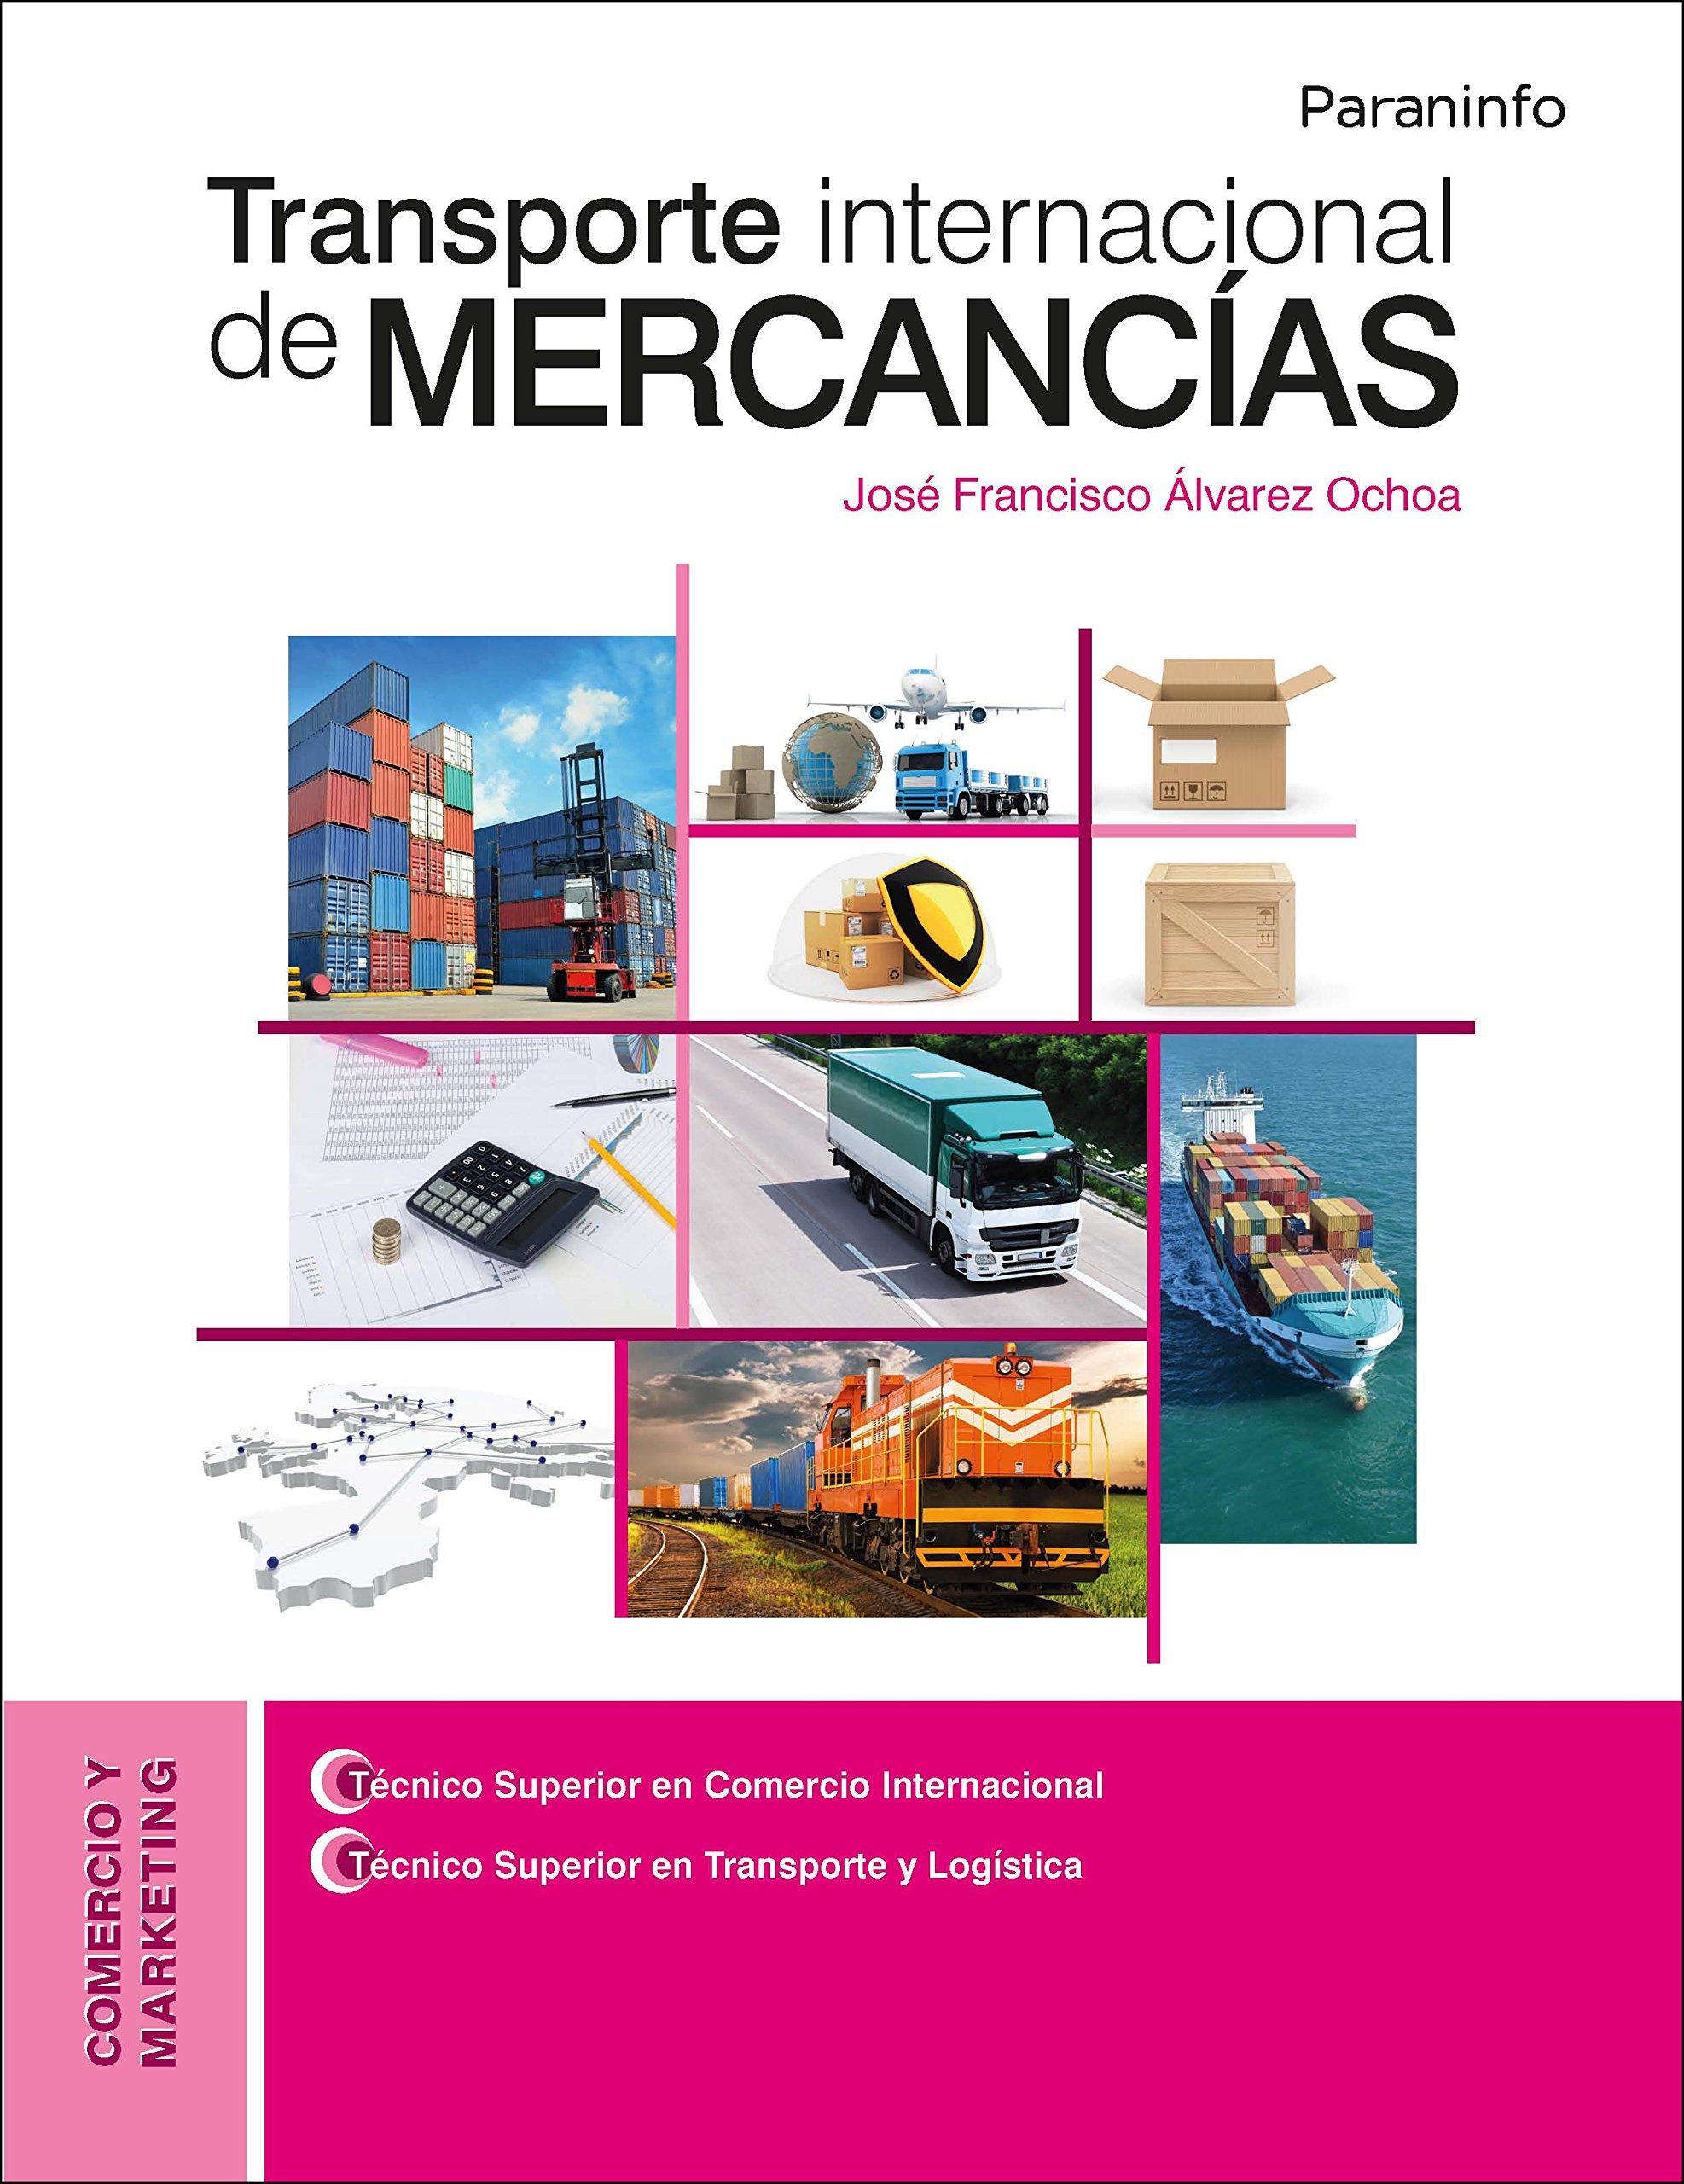 Transporte internacional de mercancías Tapa blanda – 7 jul 2016 Ediciones Paraninfo S.A 8428337748 Comercio internacional